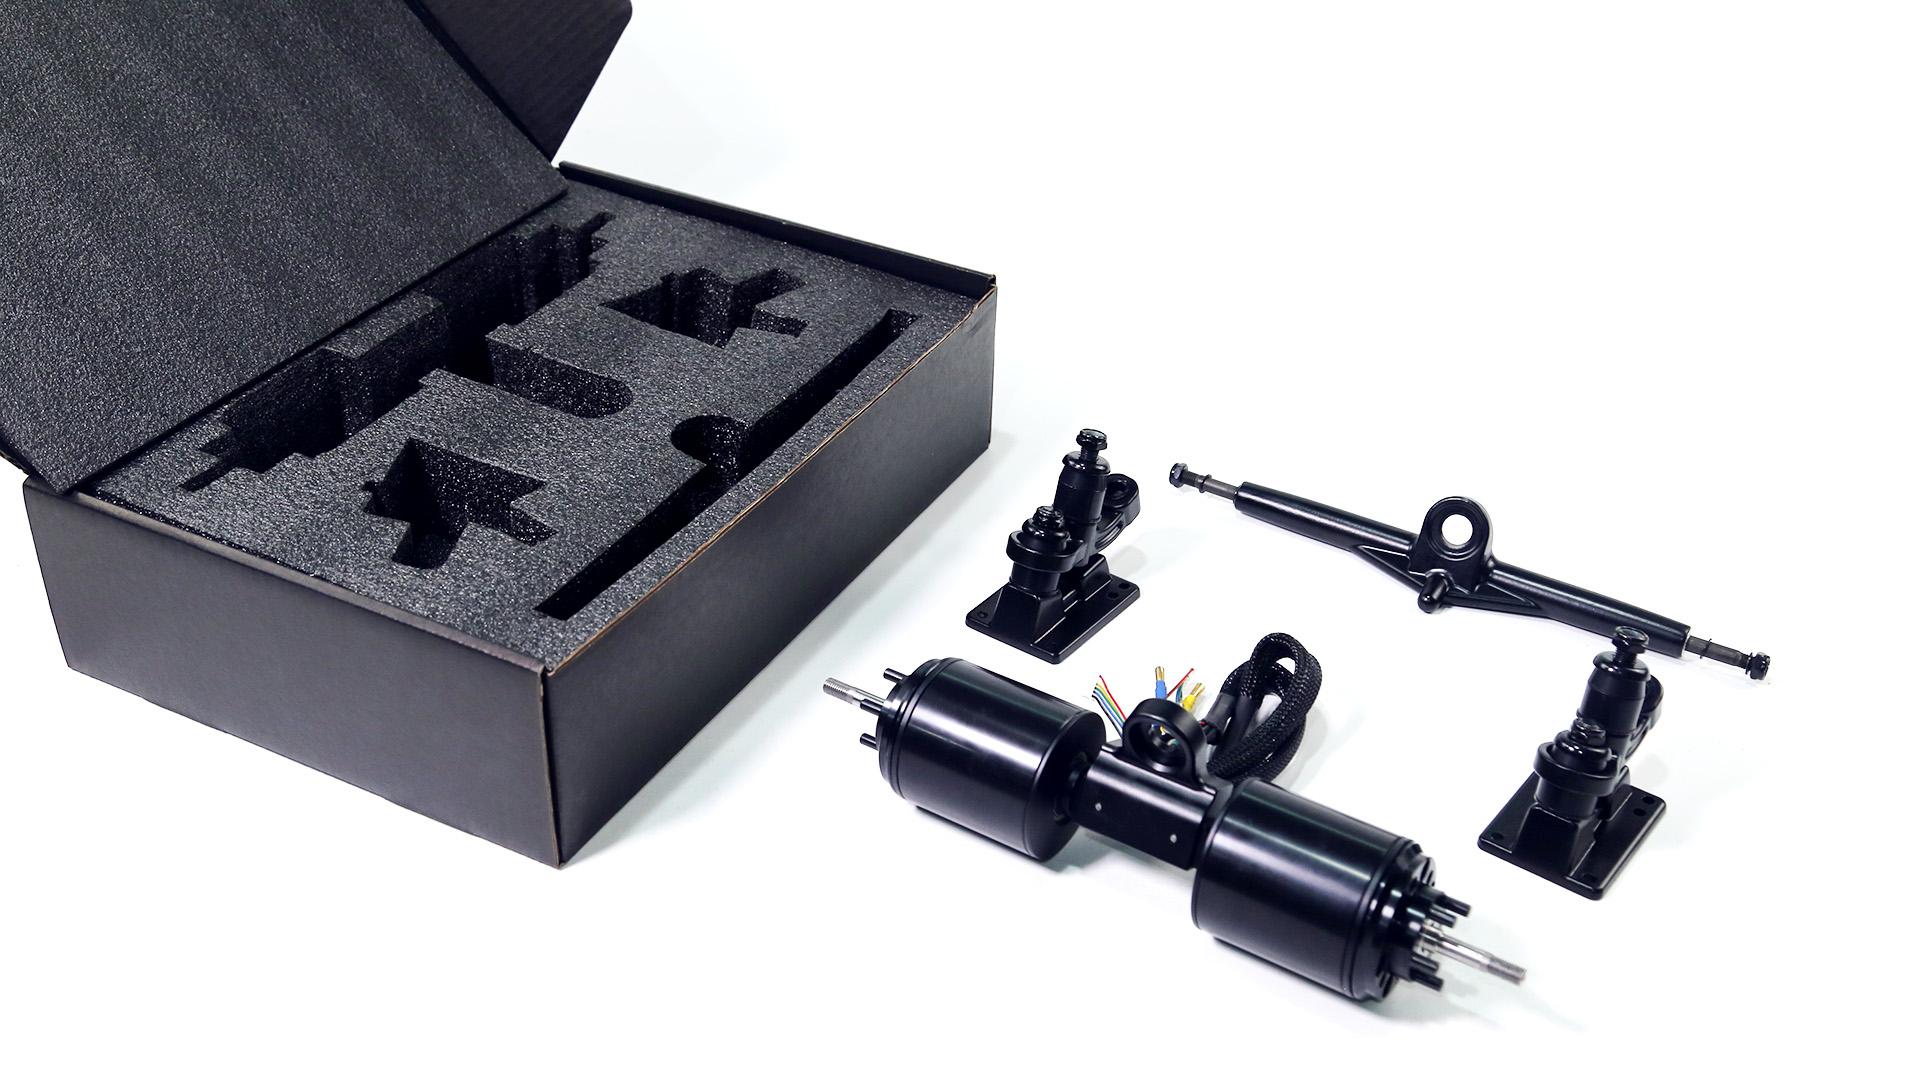 FOC Direct Drive Motor Kit for electric skateboard diy